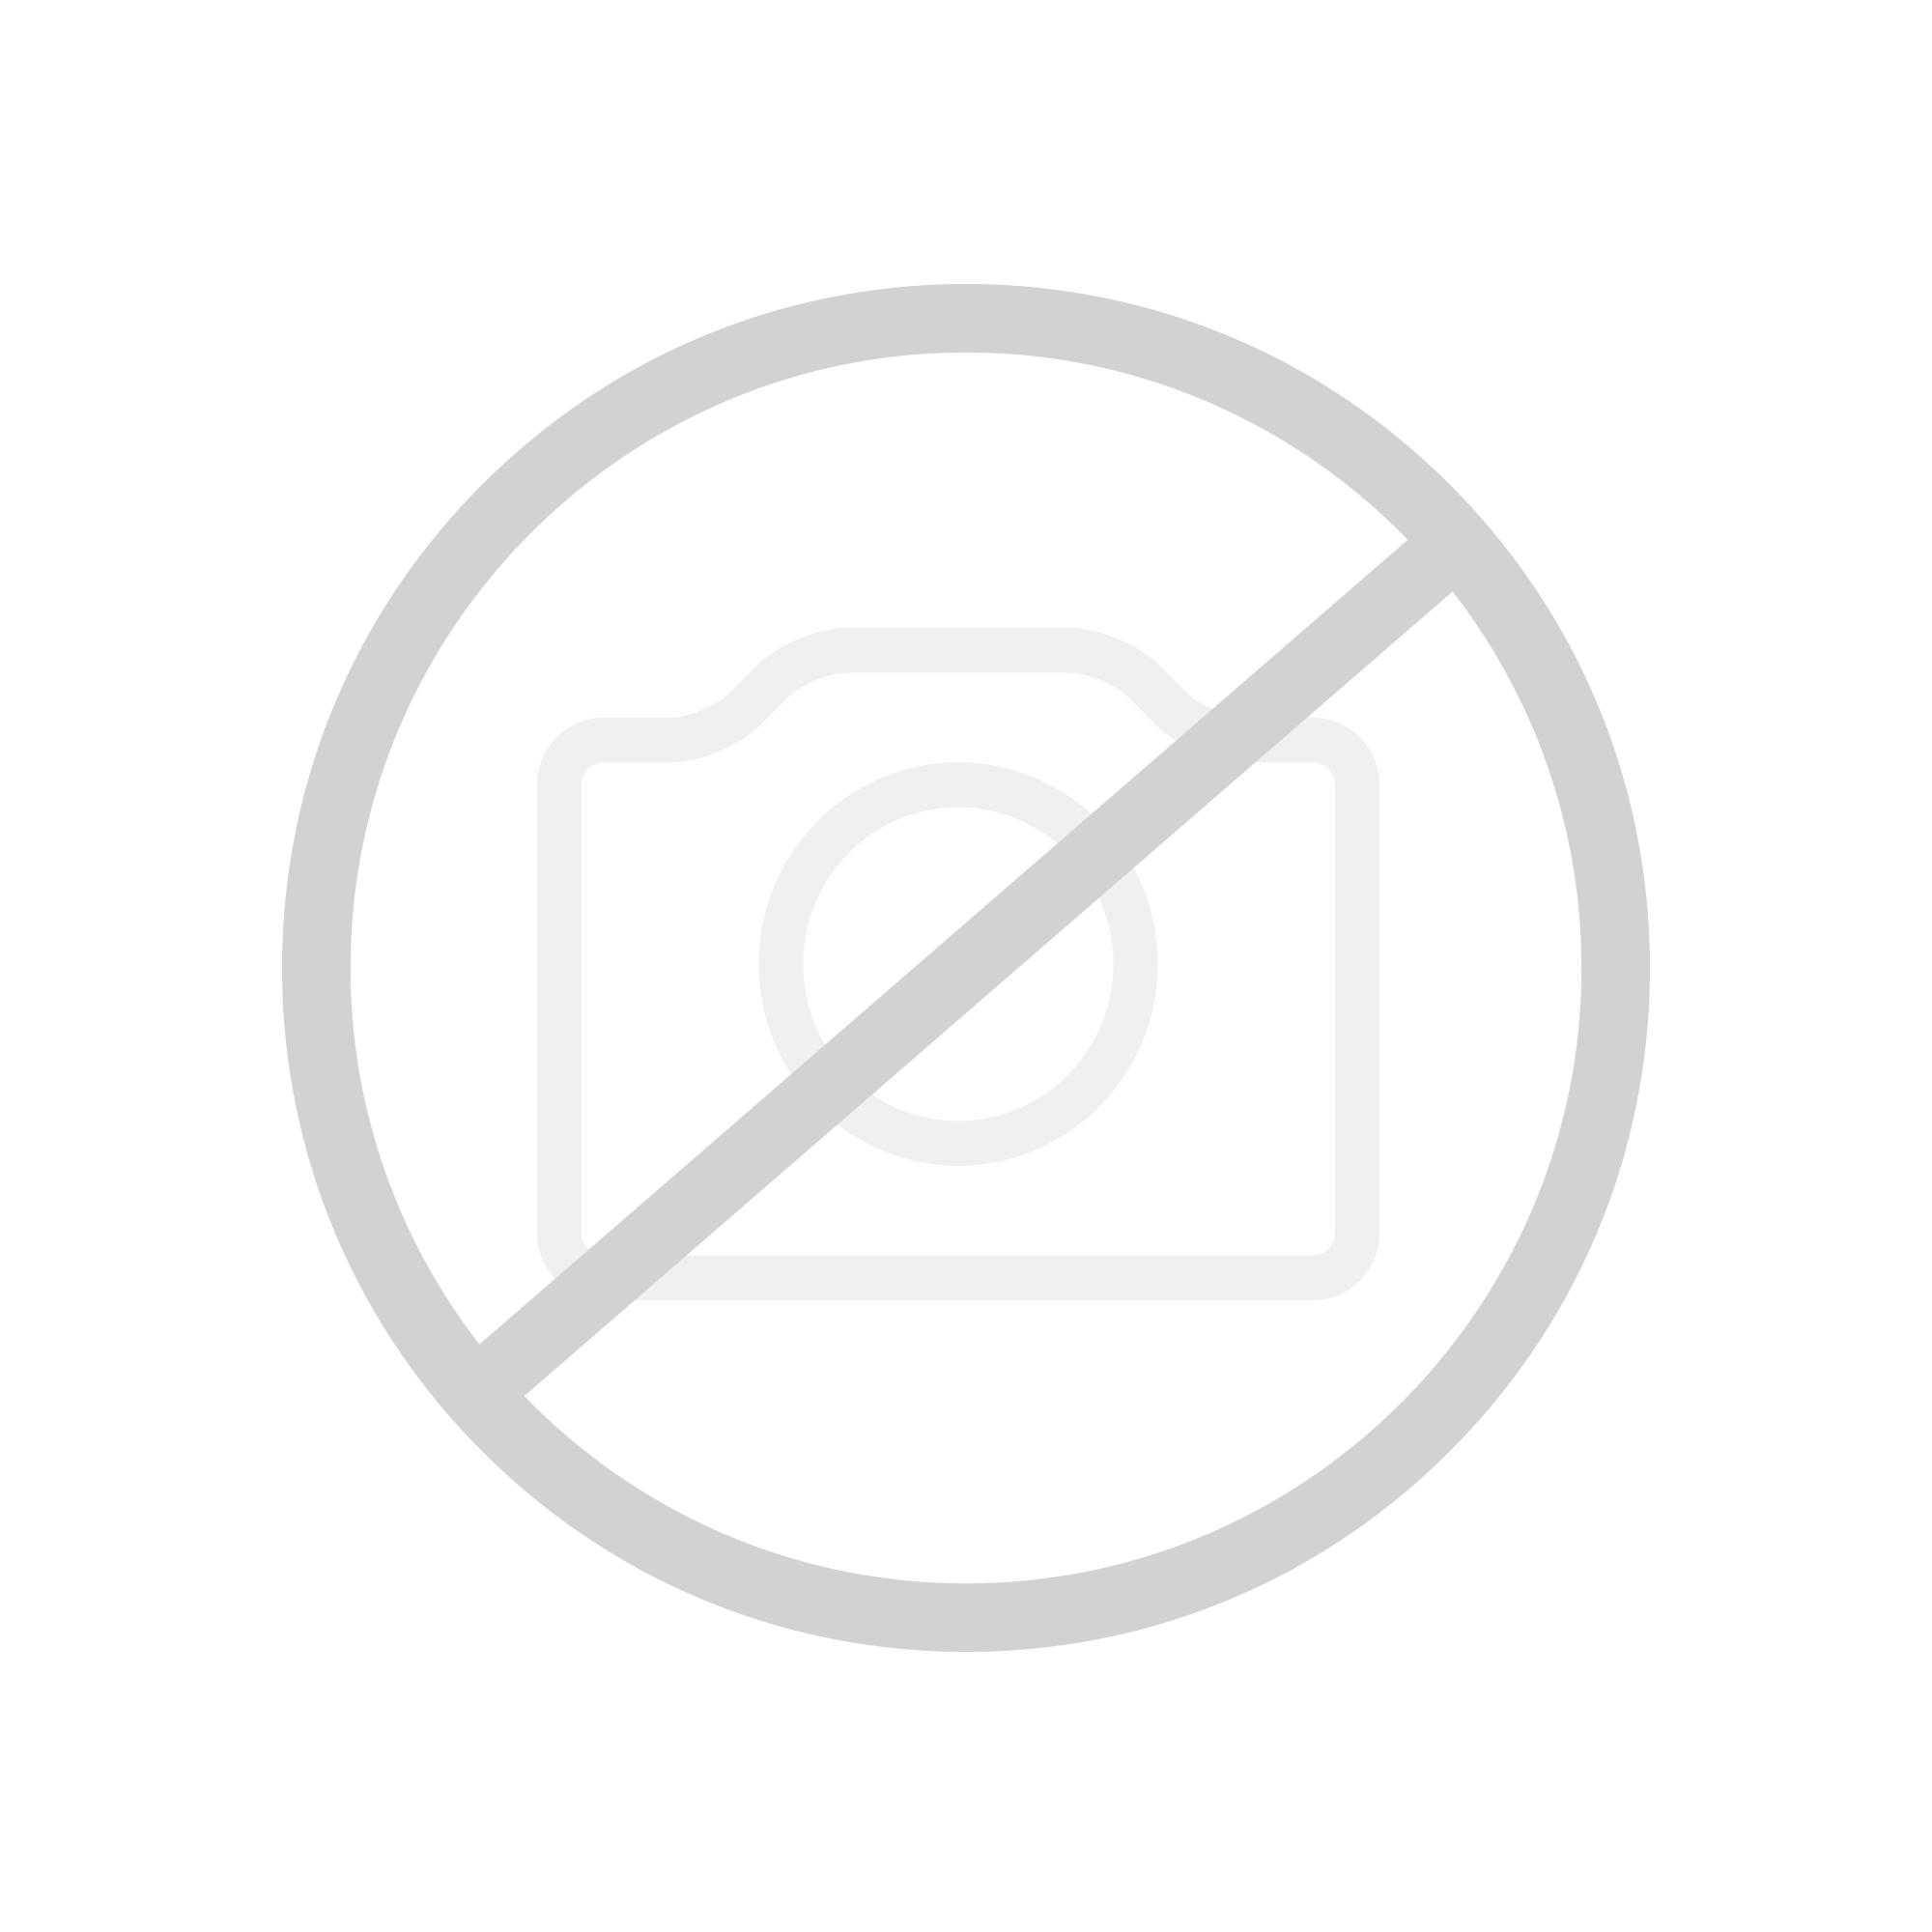 Emco Fino Flüssigseifenspender, Wandmodell